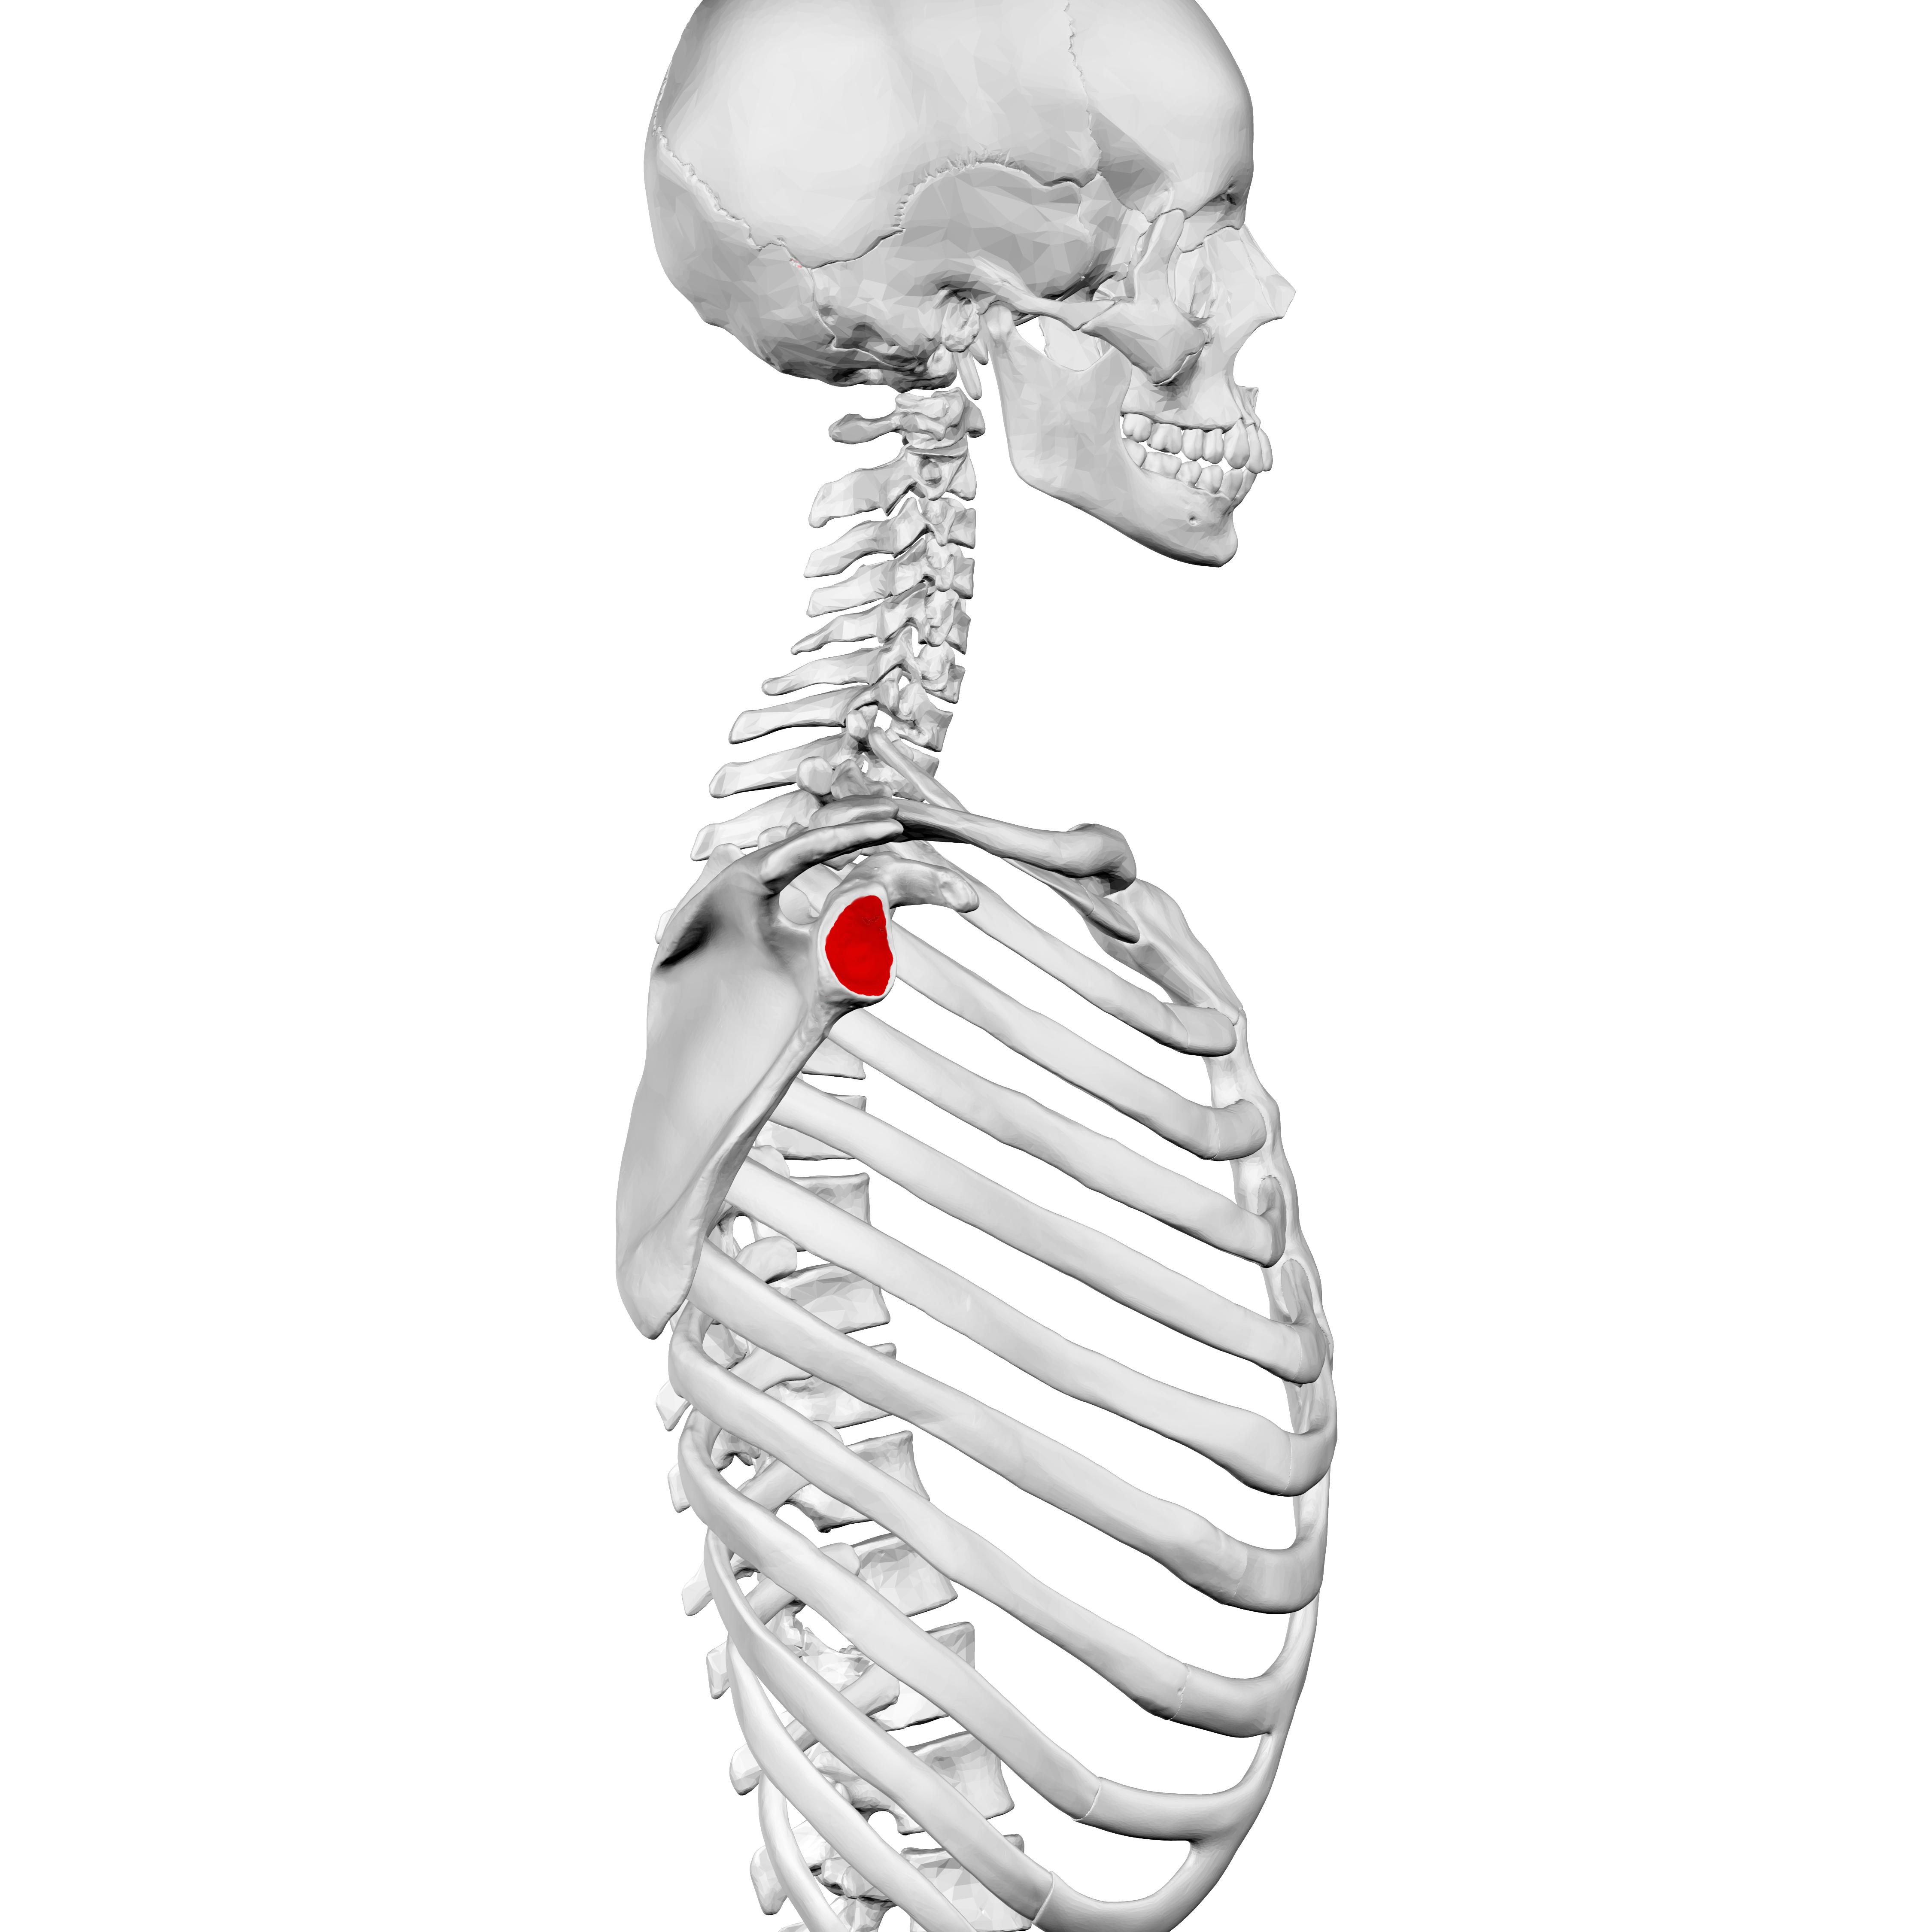 fileglenoid cavity of scapula08png